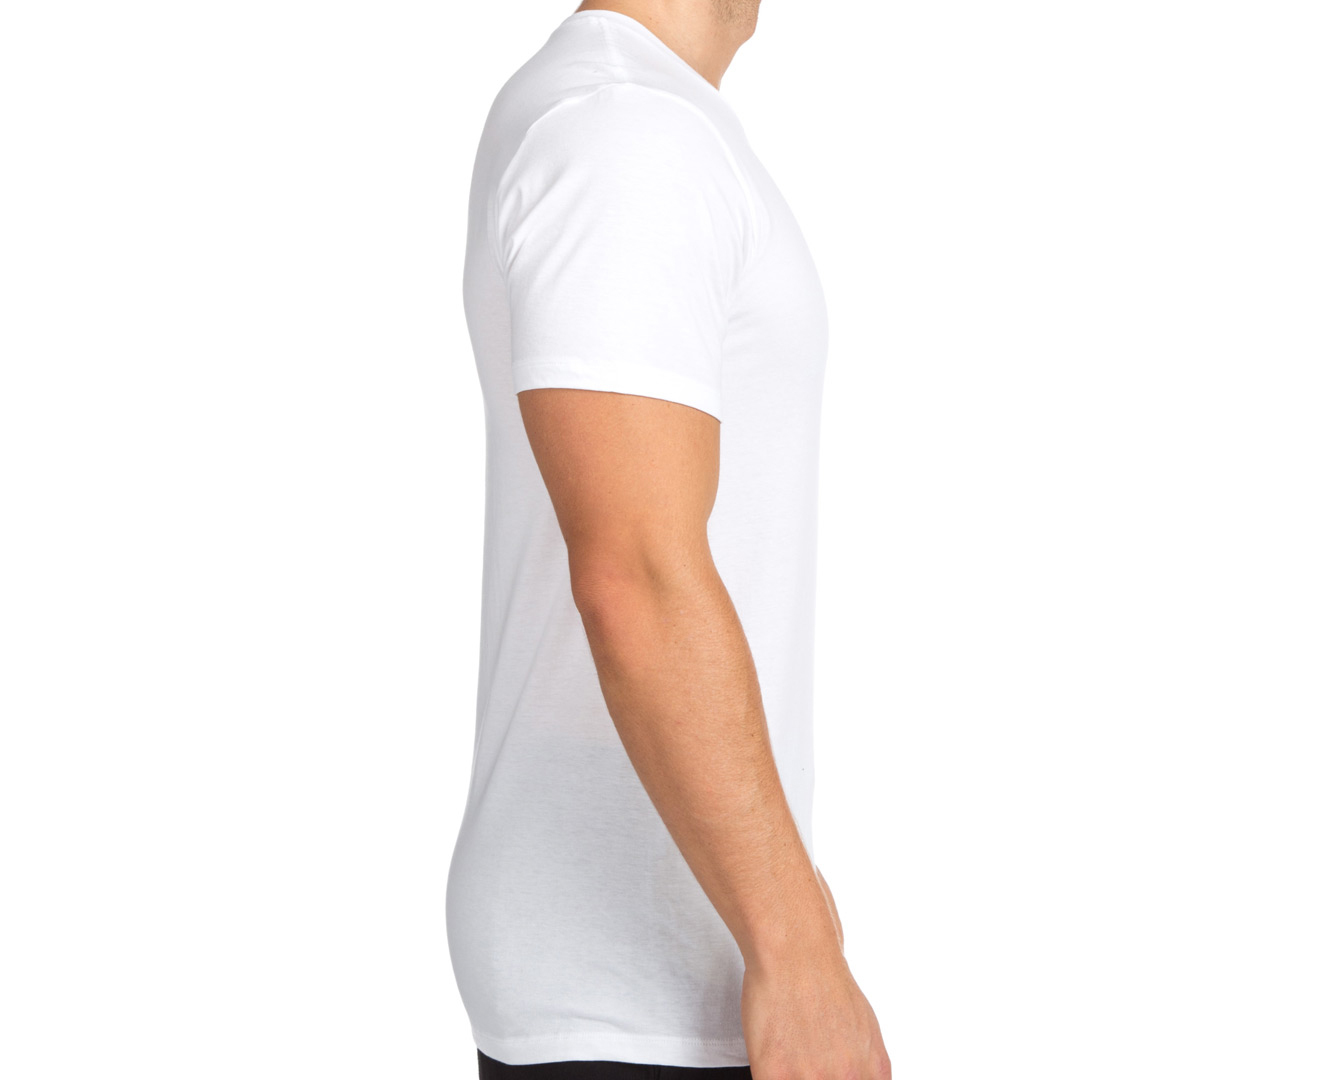 6d0f753fe Hugo Boss Men's Crew Neck T-Shirt 3-Pack - White | Catch.com.au